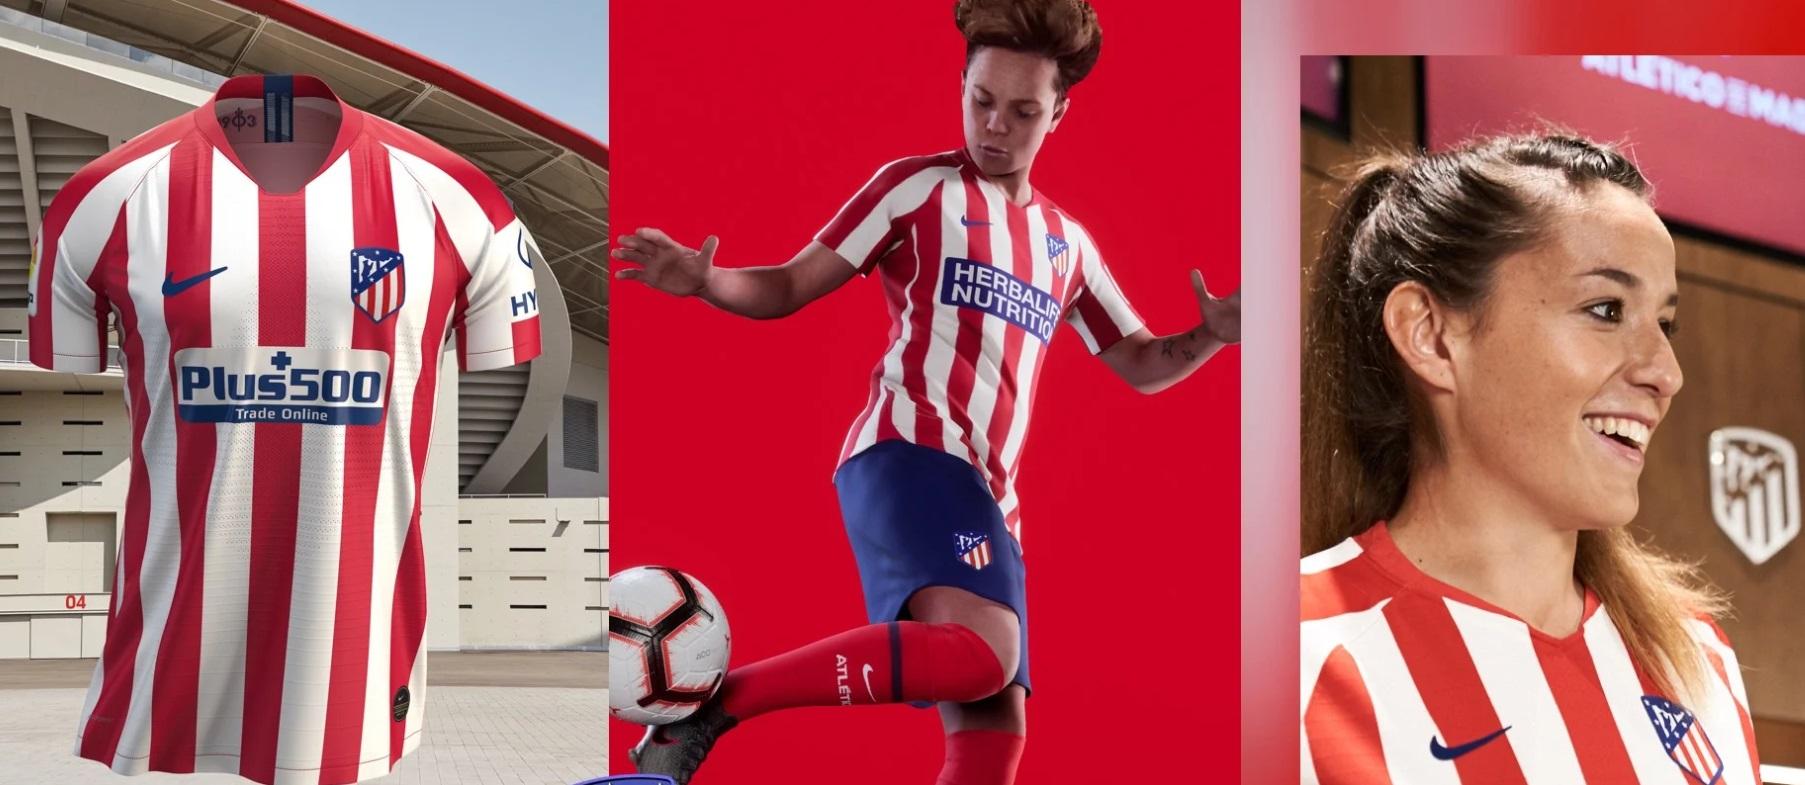 nouveau-maillot-domicile-atl%C3%A9tico-de-madrid-19-20-nike-football-home-kit.jpg